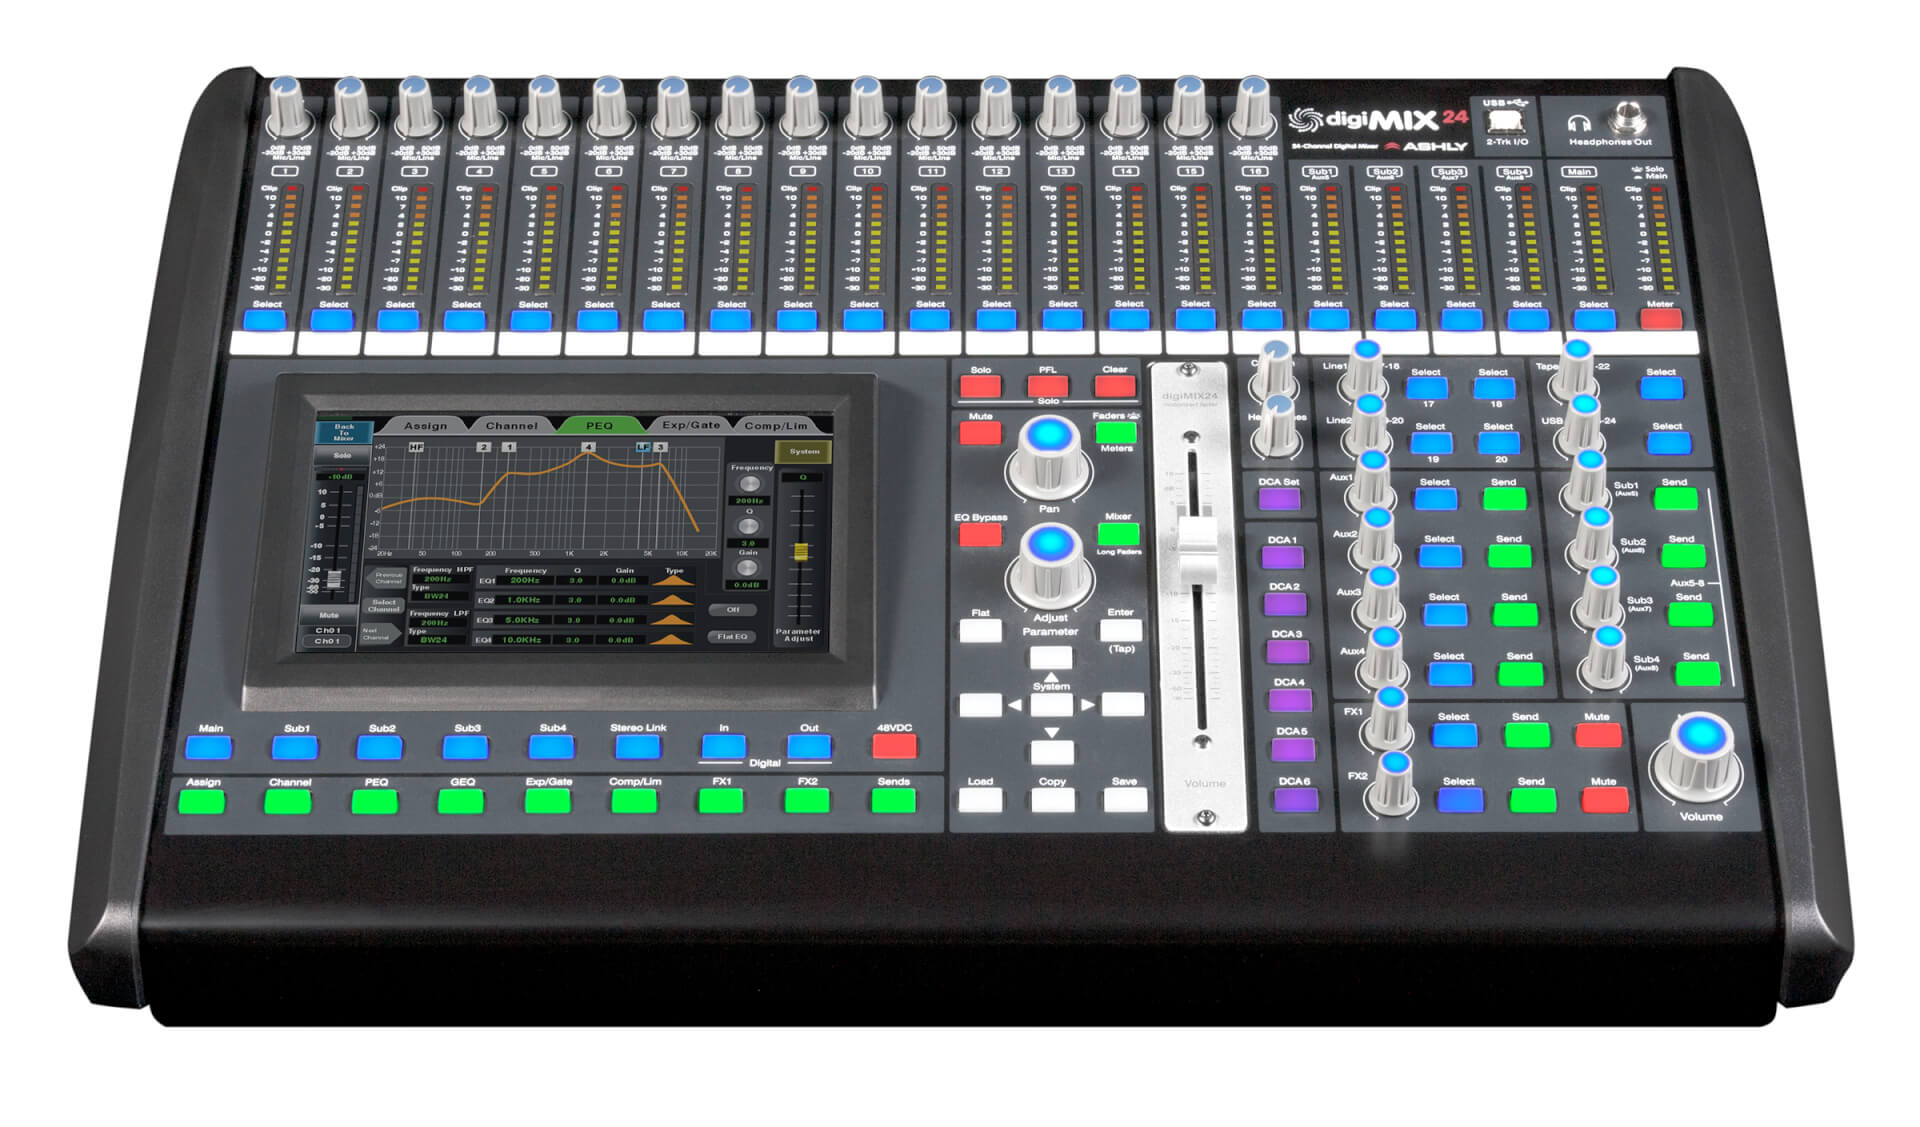 digimix digital mixers ashly audio. Black Bedroom Furniture Sets. Home Design Ideas